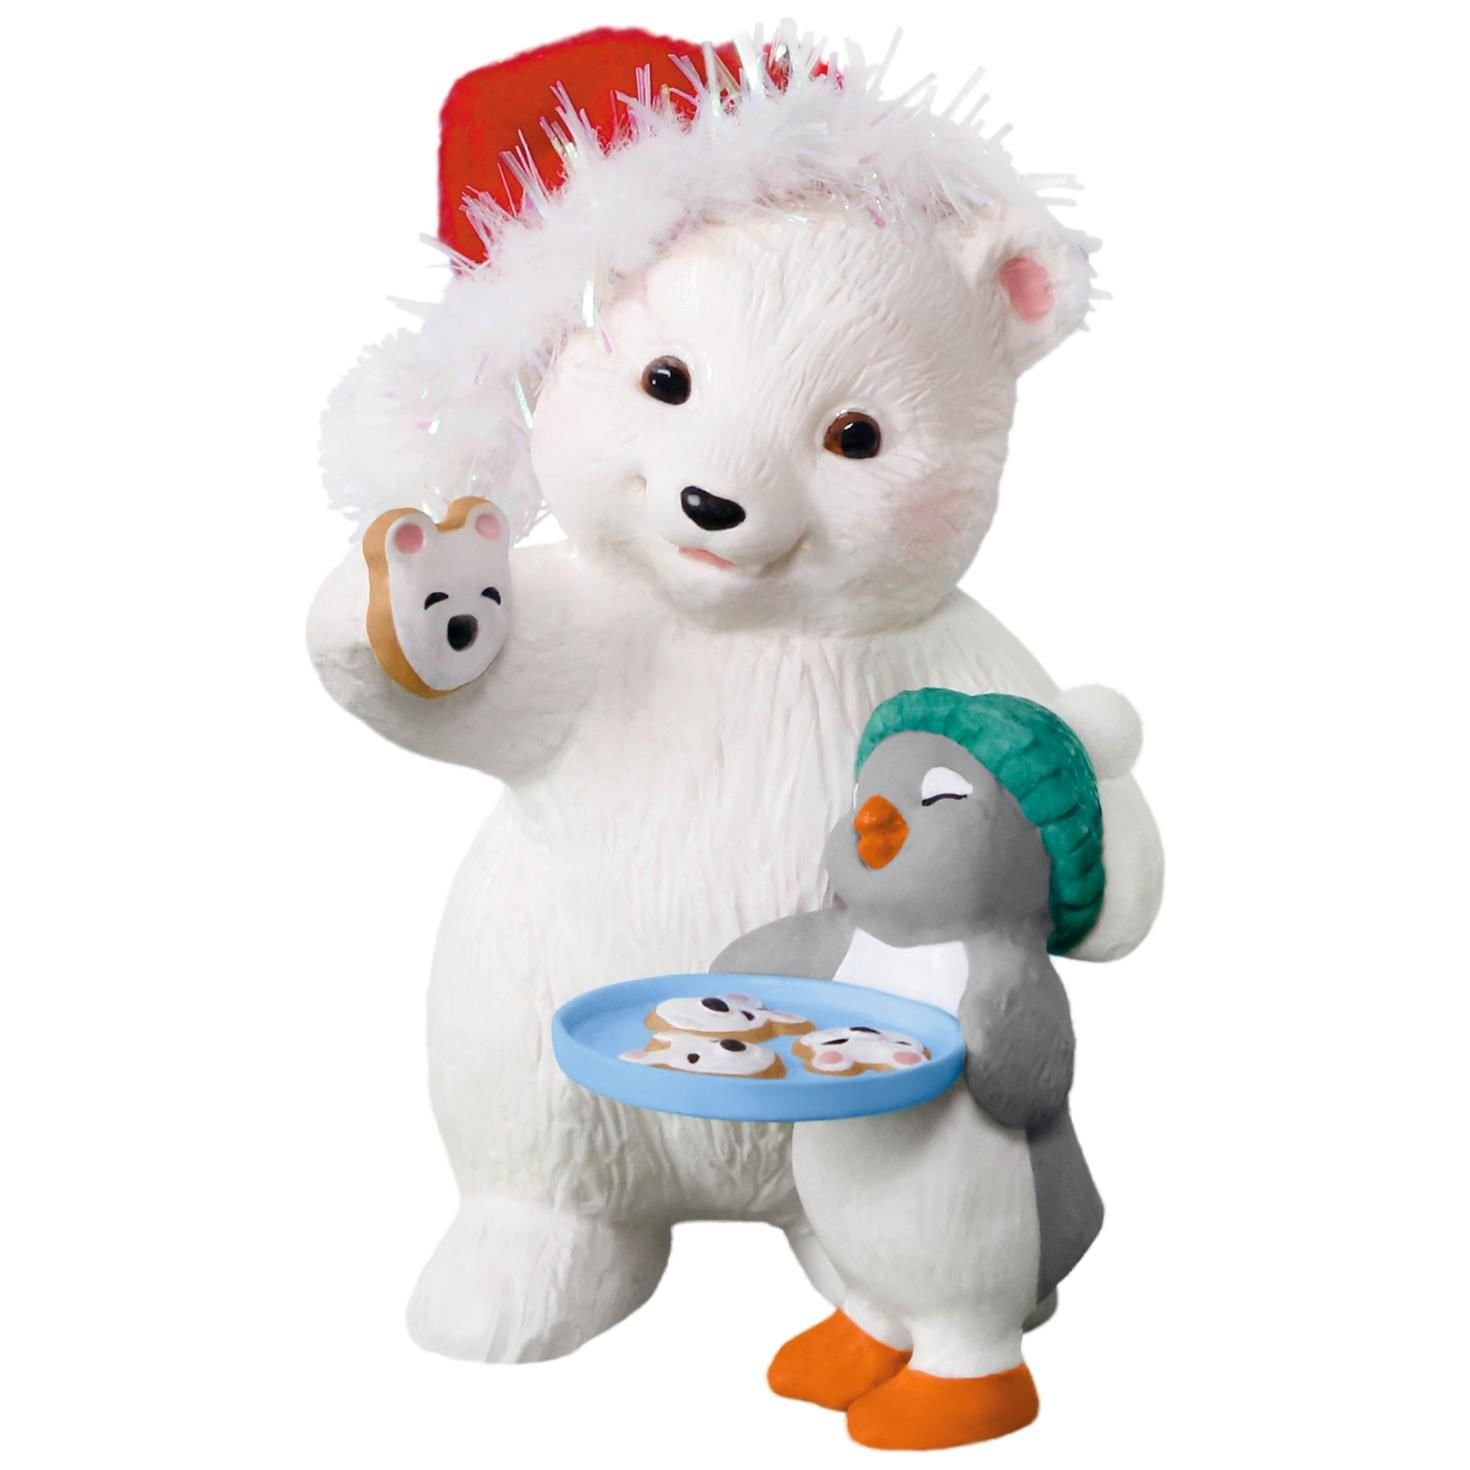 Hallmark Keepsake 2017 Snowball and Tuxedo Cookies for Santa Christmas Ornament